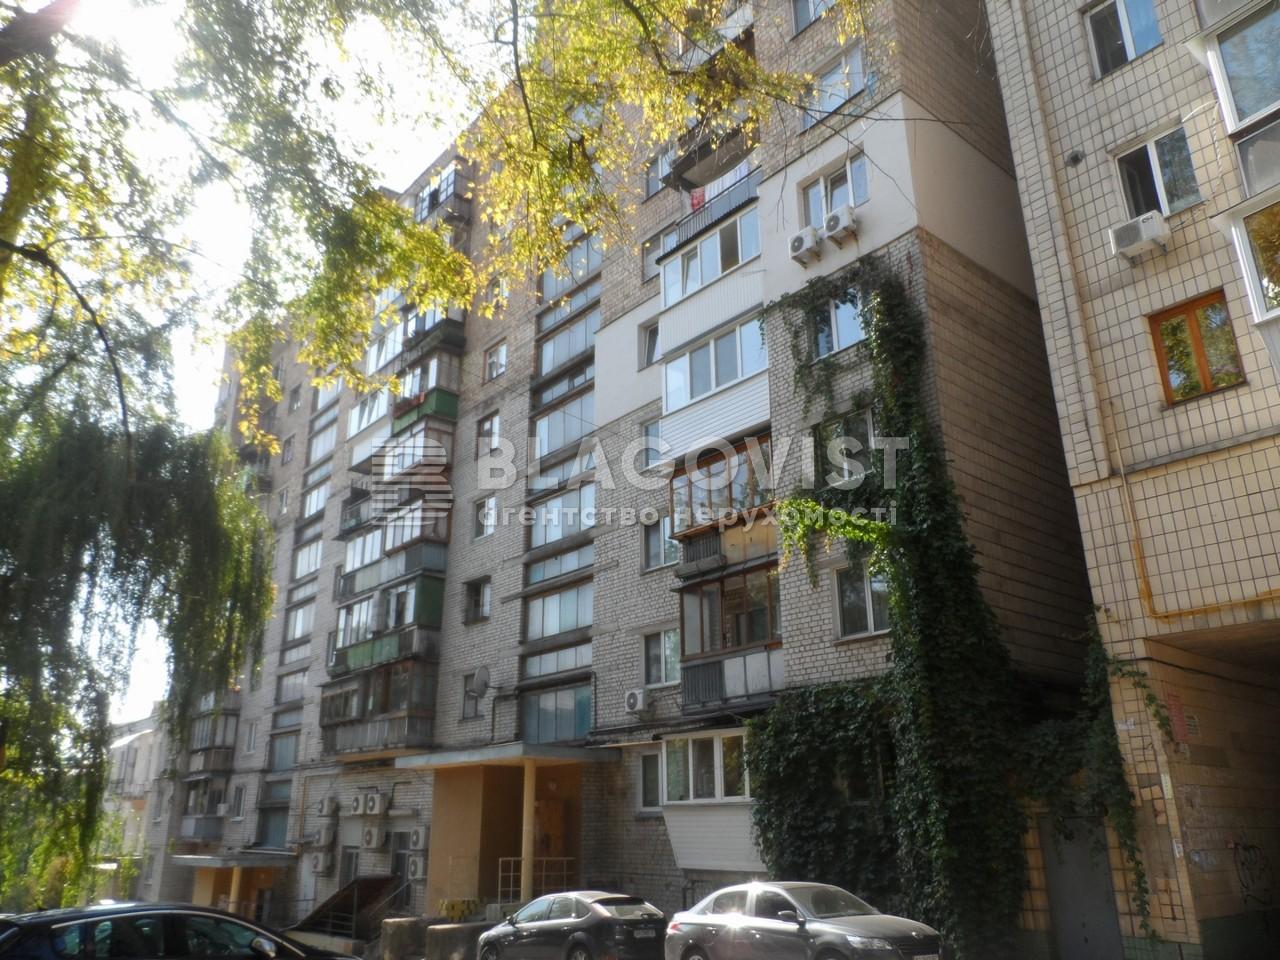 Квартира F-45467, Владимирская, 89/91, Киев - Фото 2